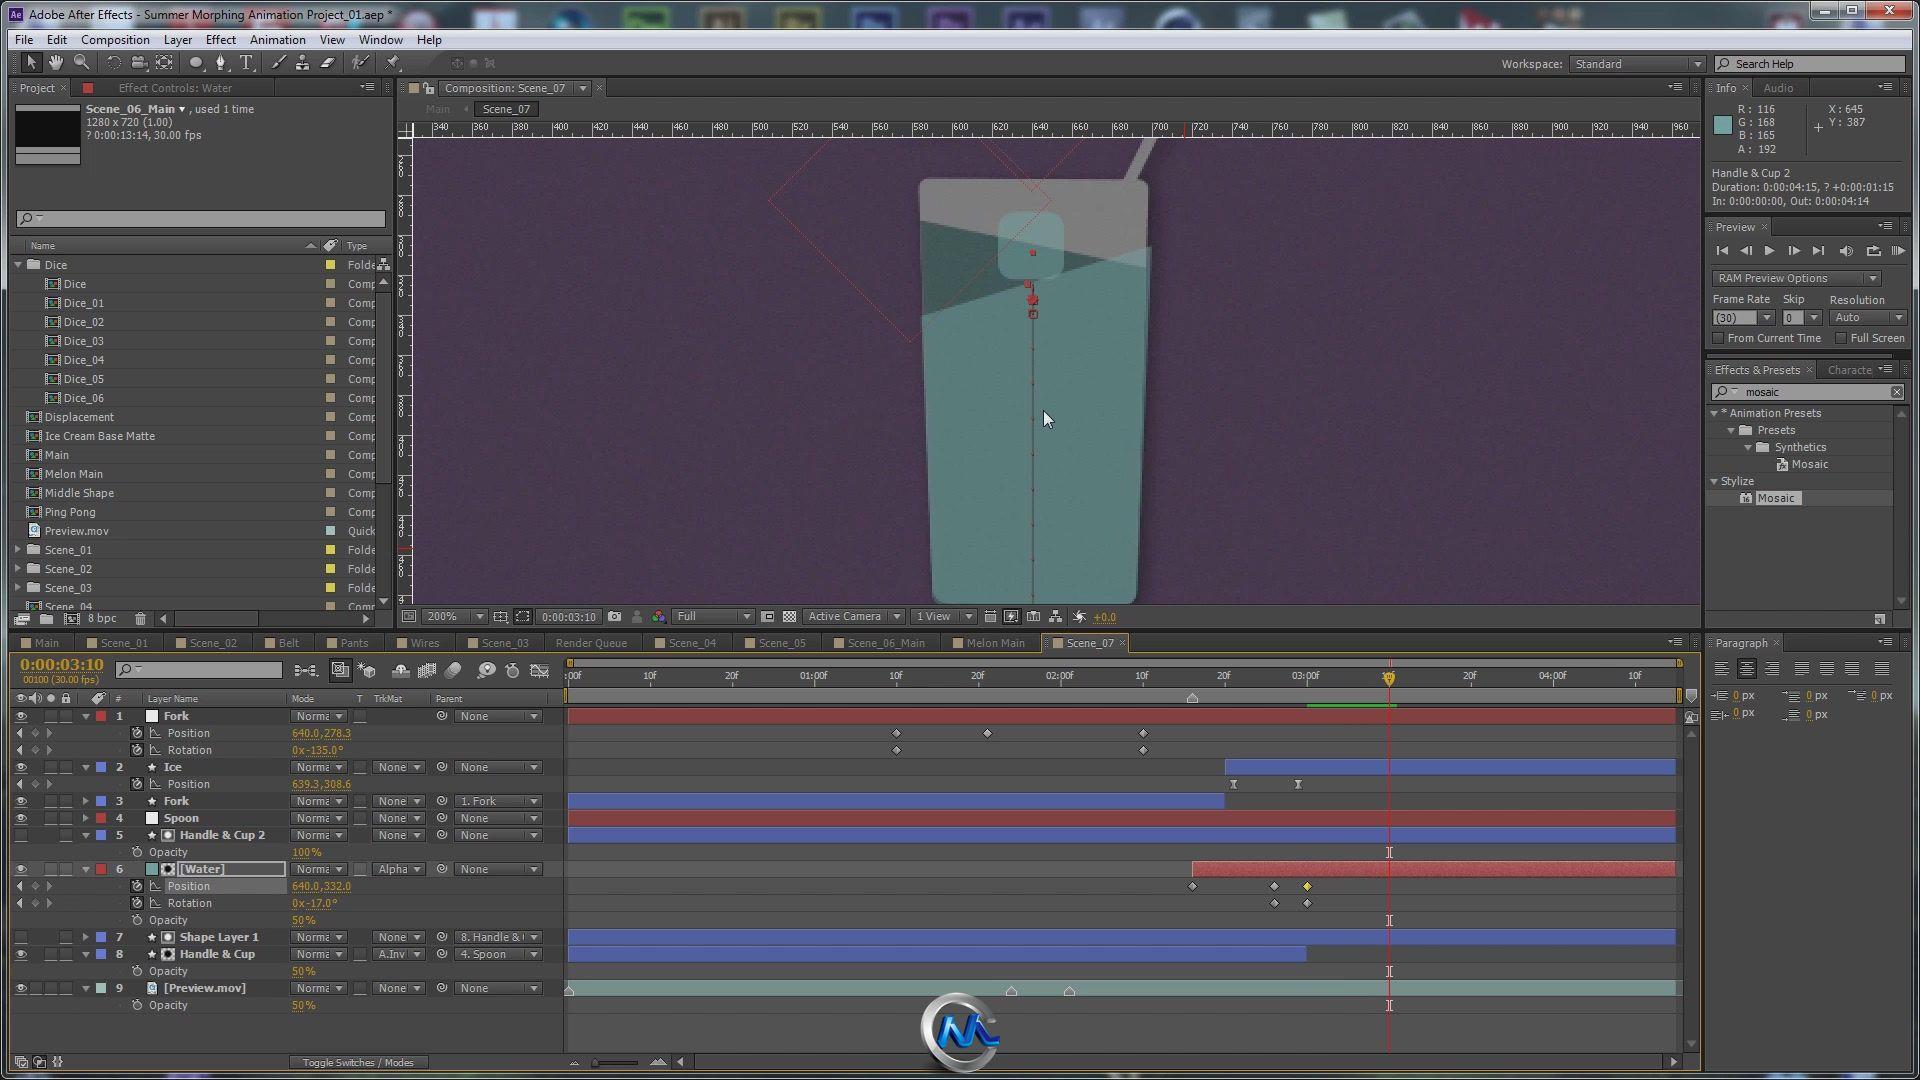 《AE图形变形关键帧动画高级教程》AETuts+ Create a Morphing Simple Summer Shapes Animation